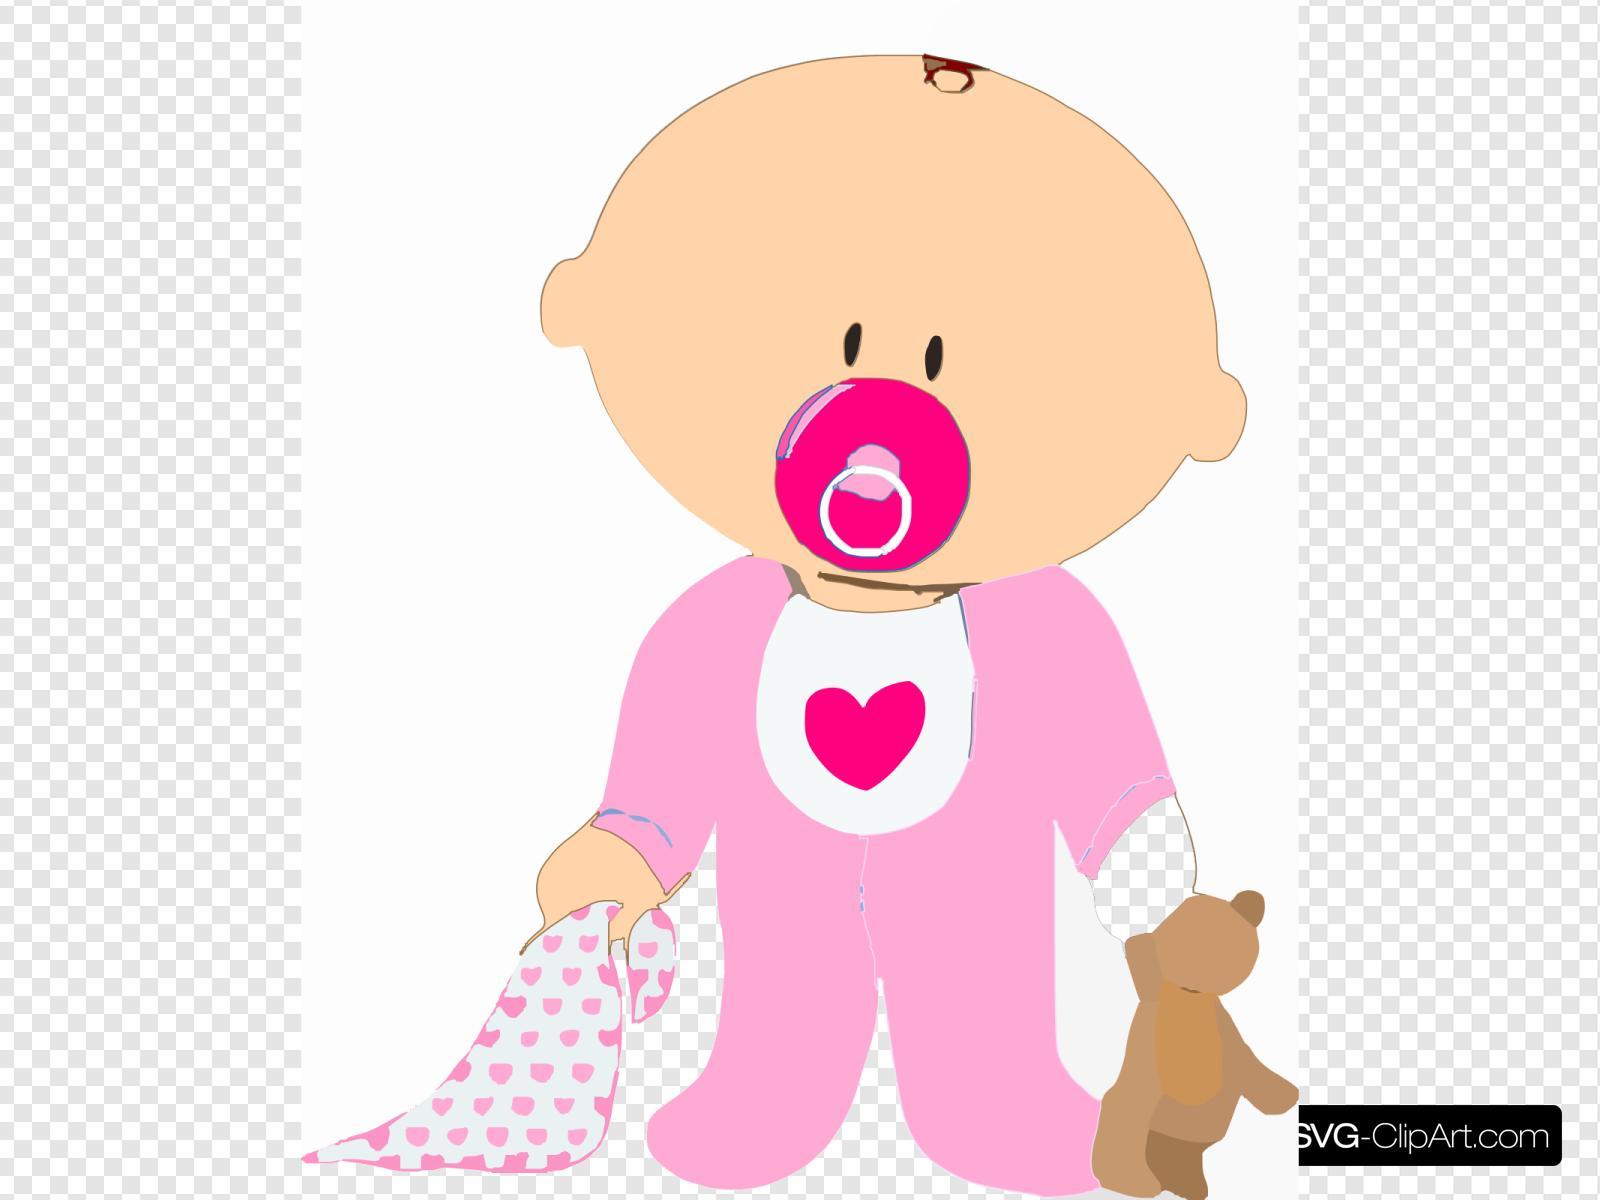 Babygirl Svg Vector Babygirl Clip Art Svg Clipart